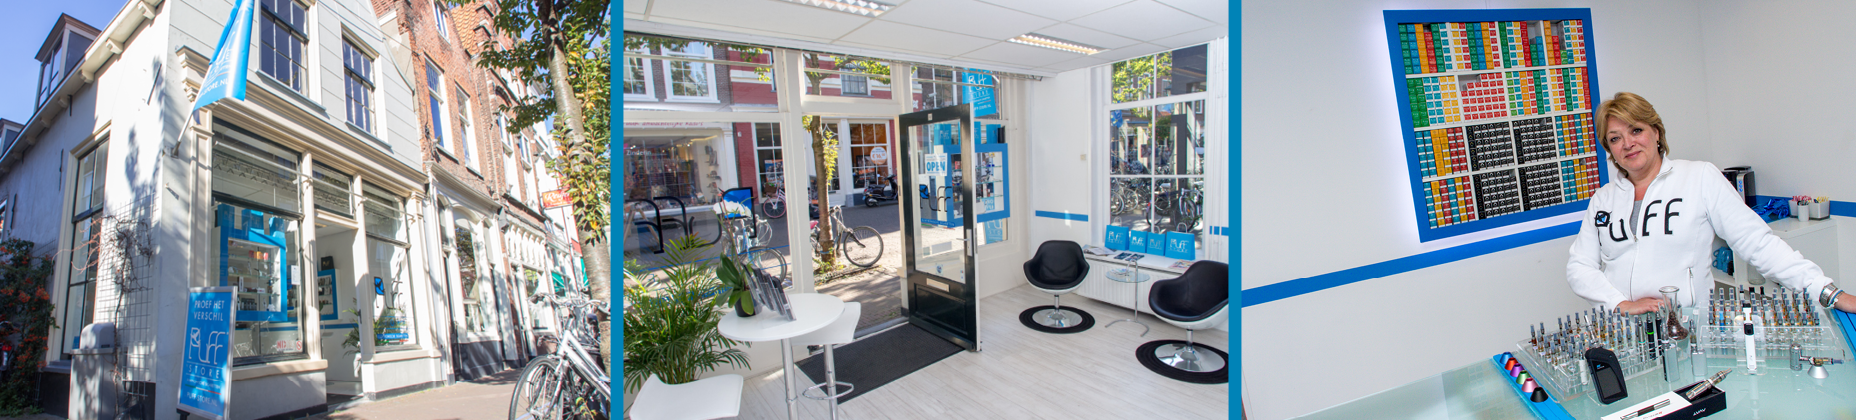 Puff Store Delft header